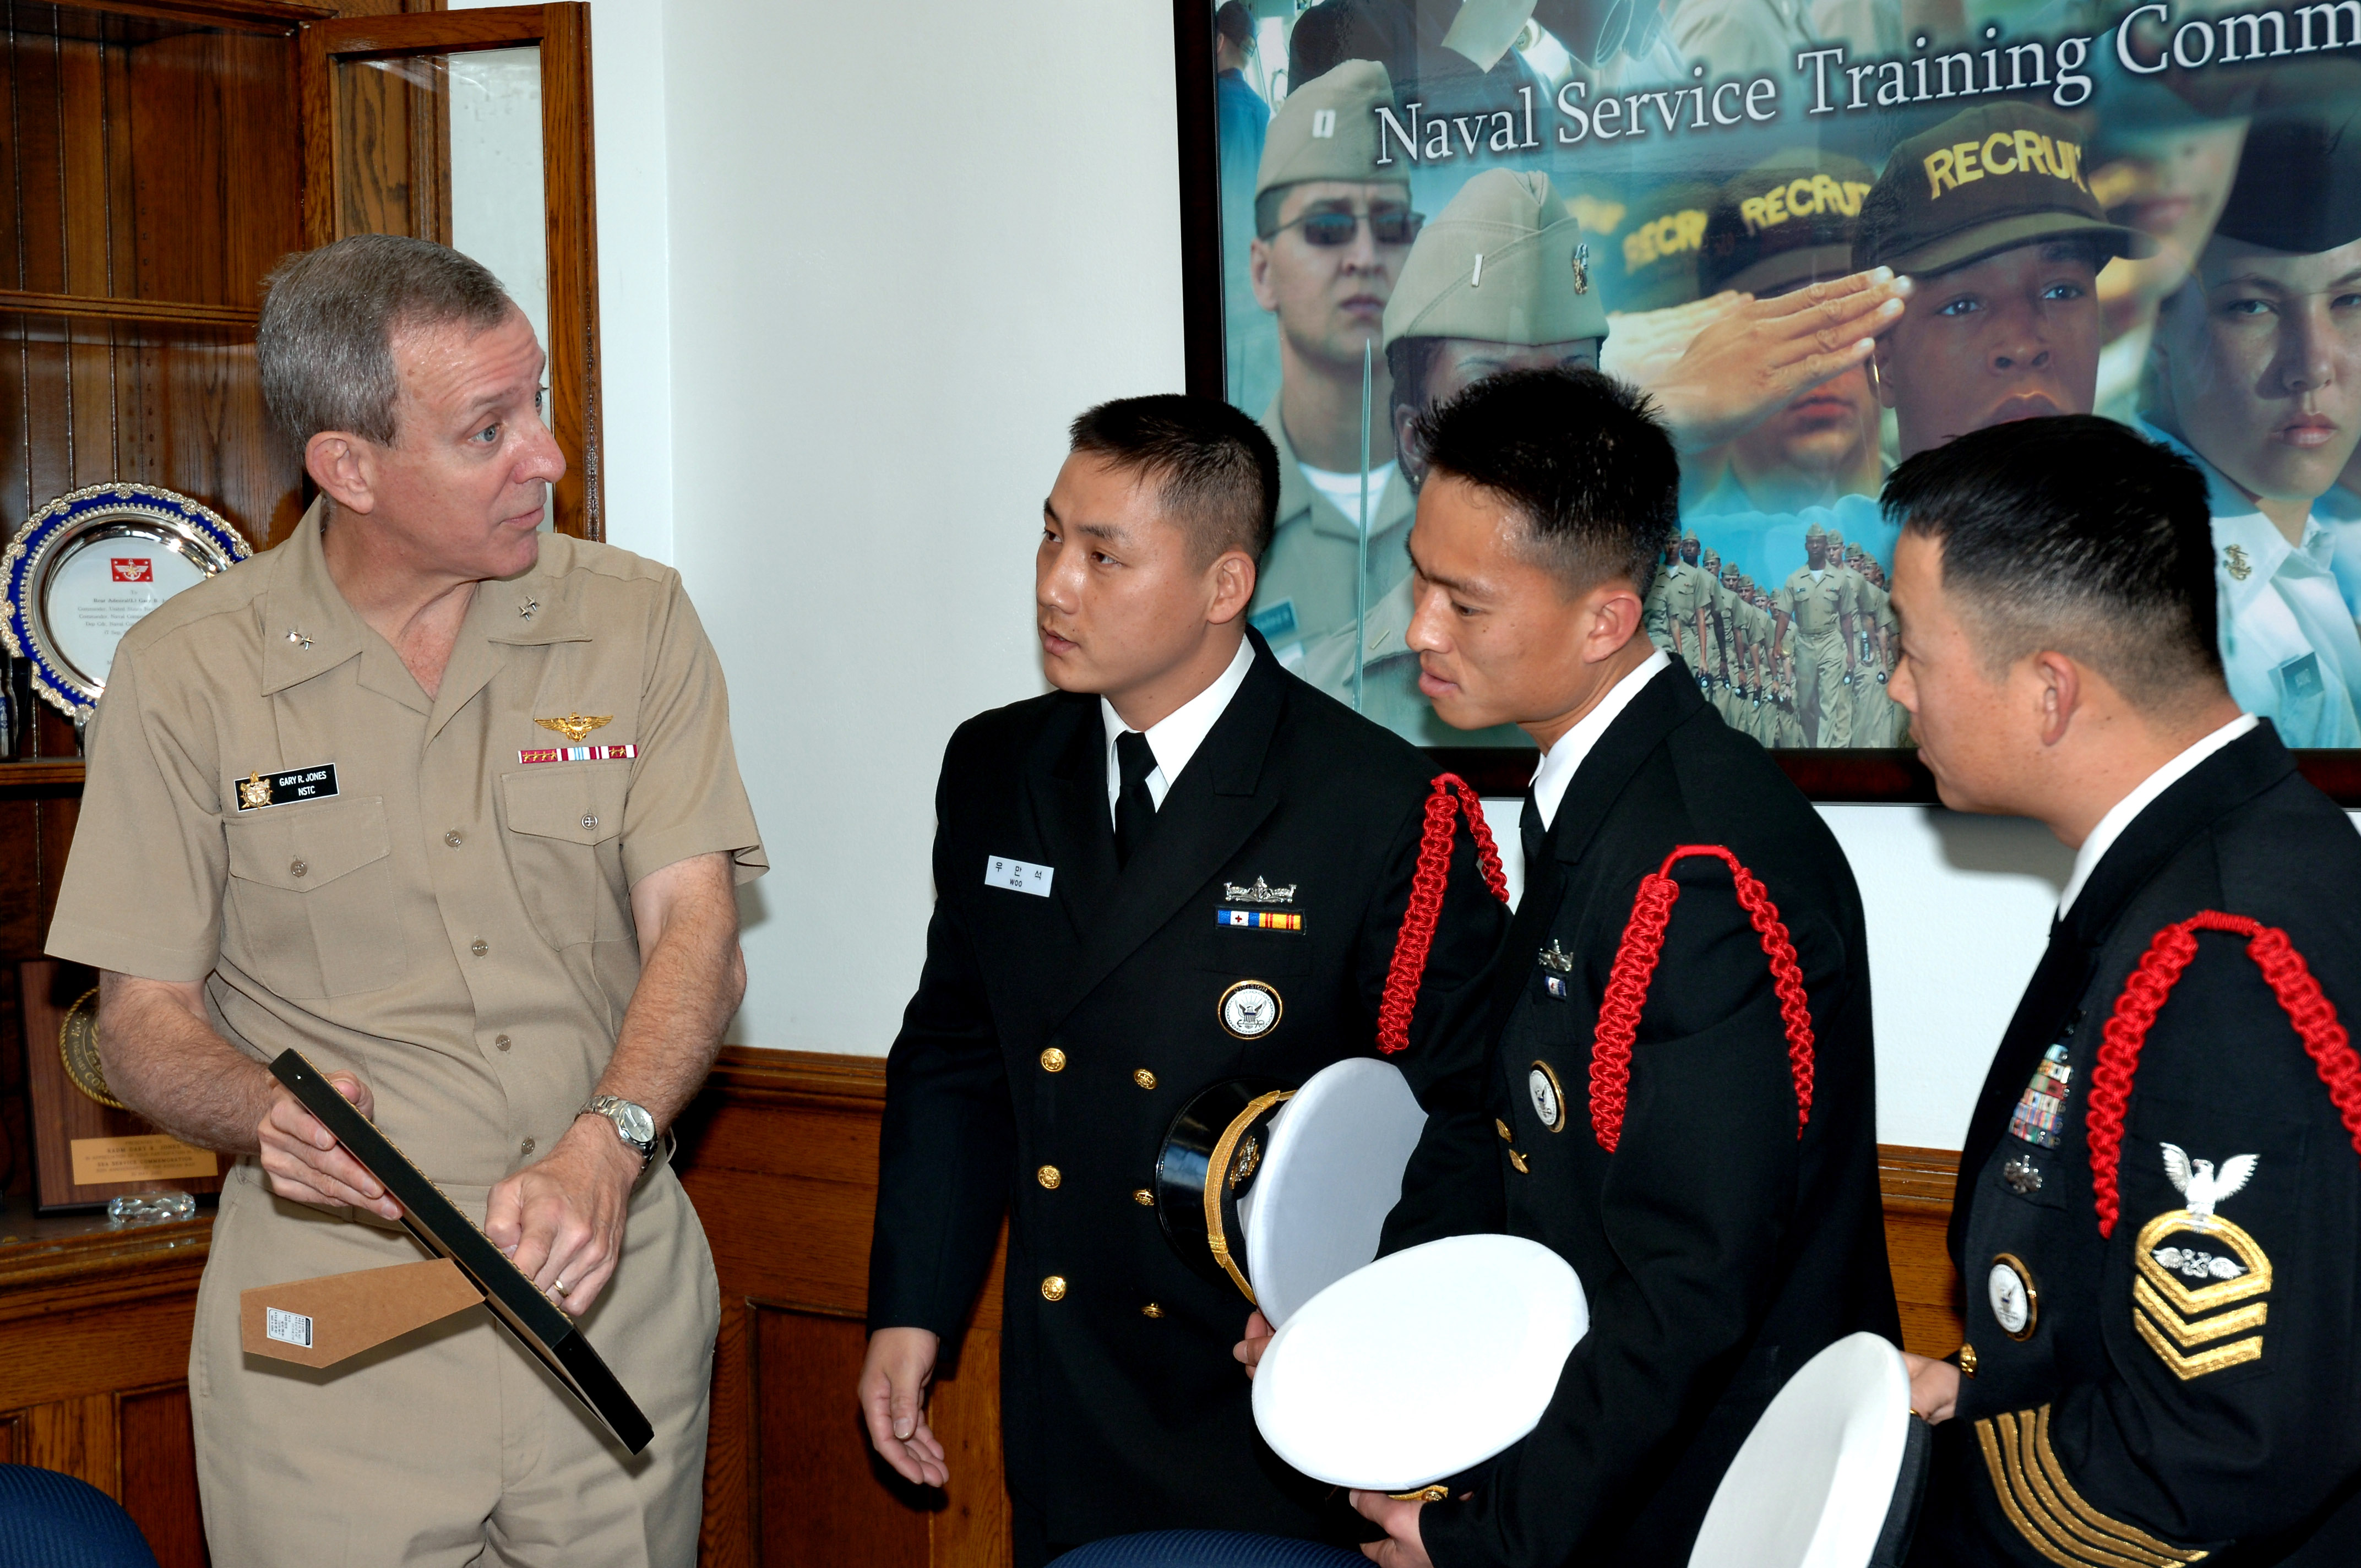 fileus navy 061025 n 1592s 001 commander naval service training command rear adm gary r